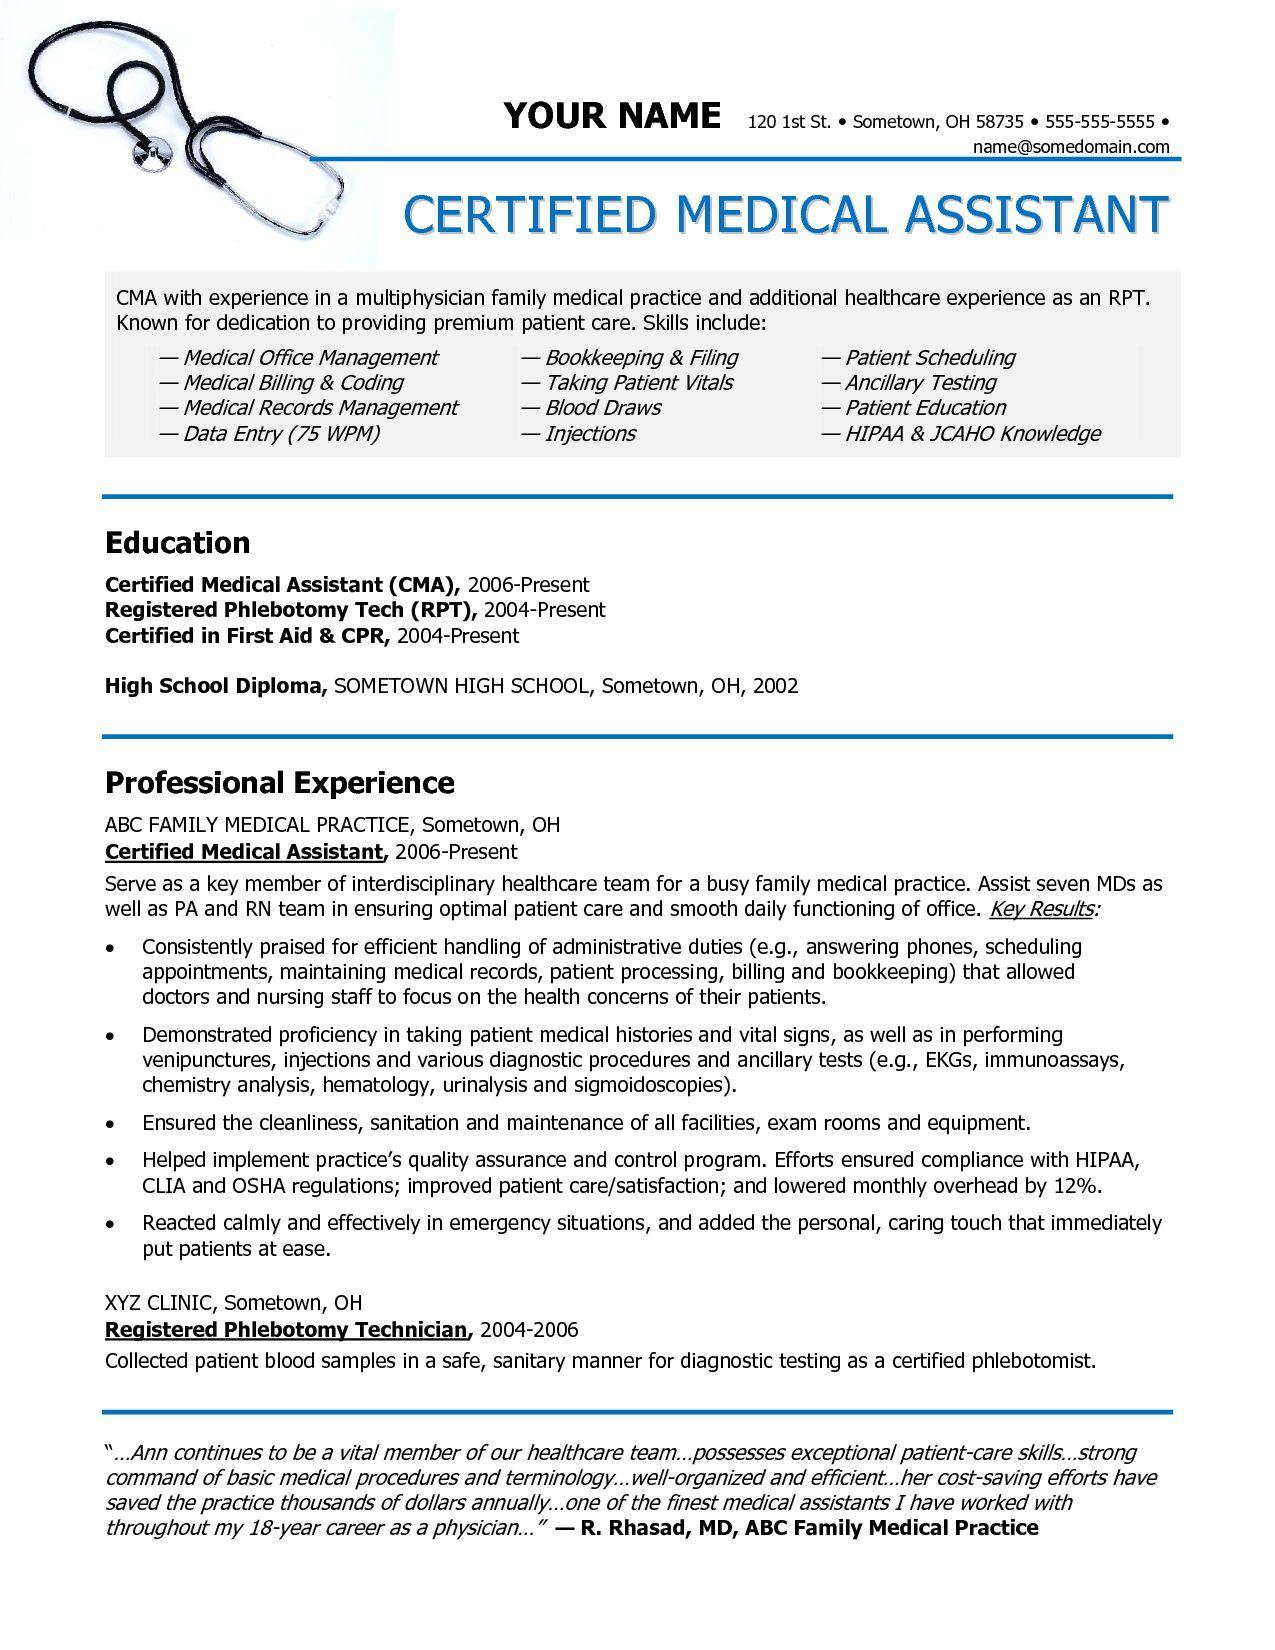 006 Sensational Medical Resume Template Free Image  Receptionist Cv CoderFull